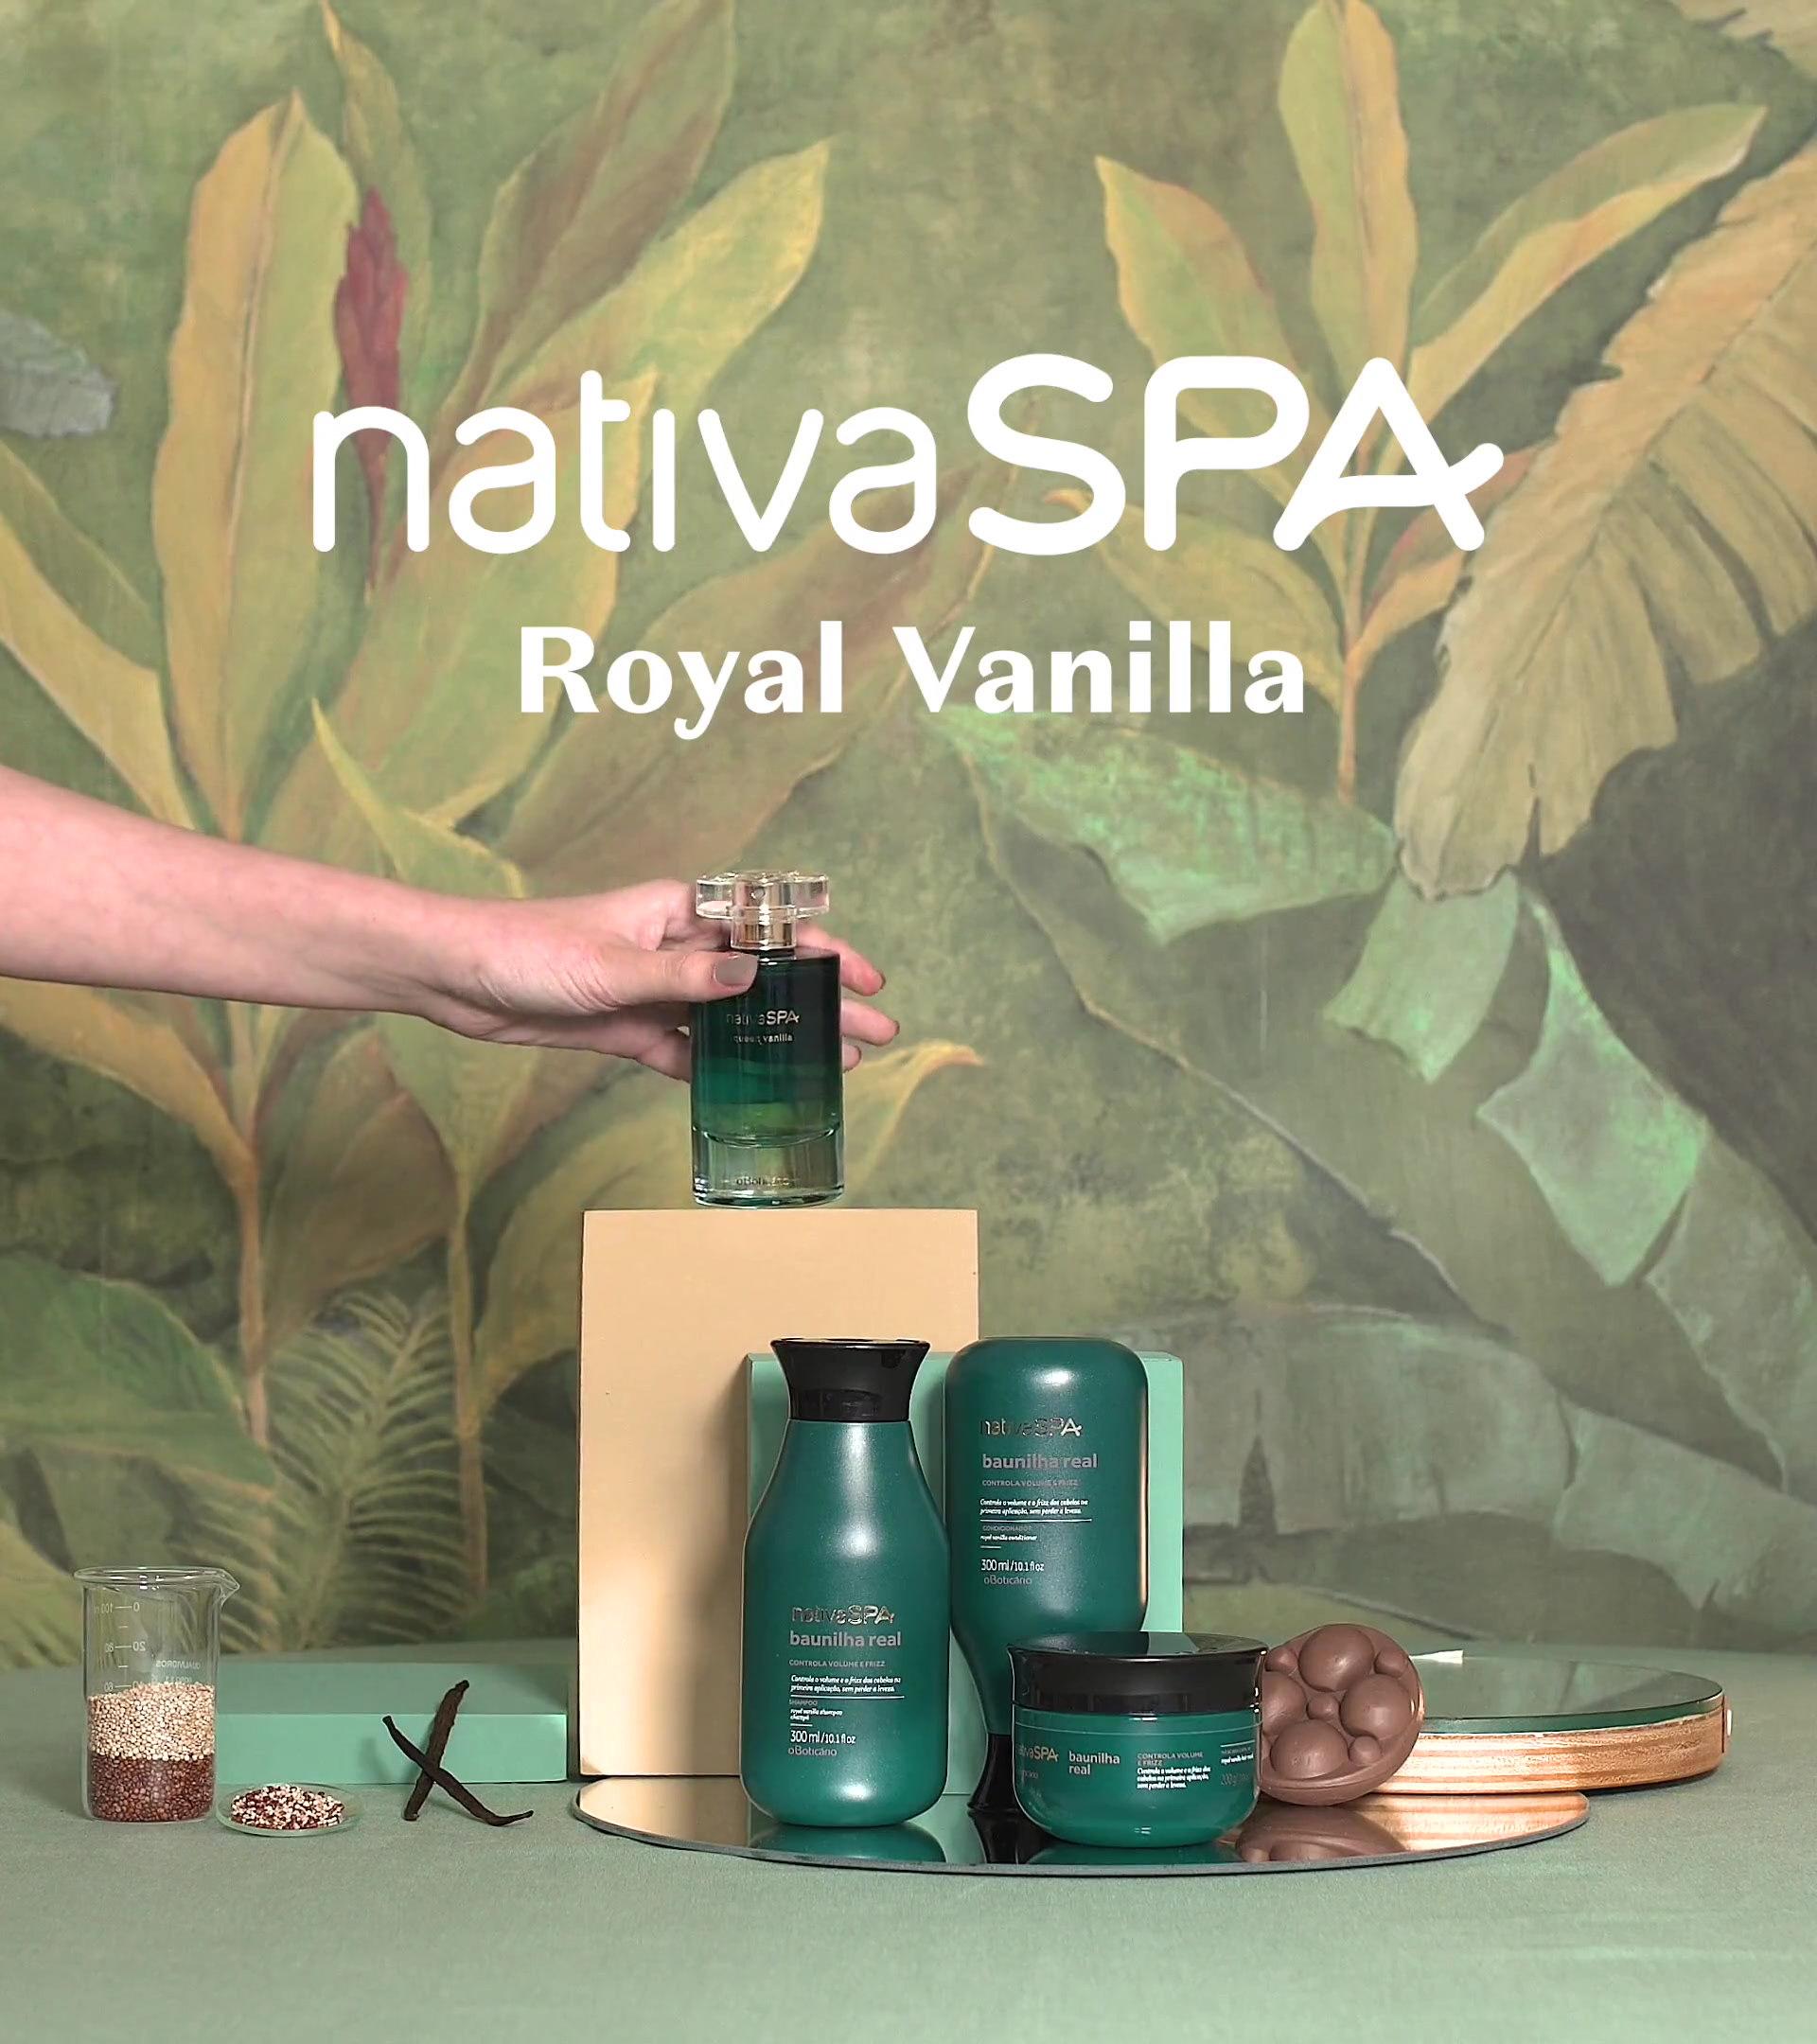 Video Nativa SPA Royal Vanilla O Boticário